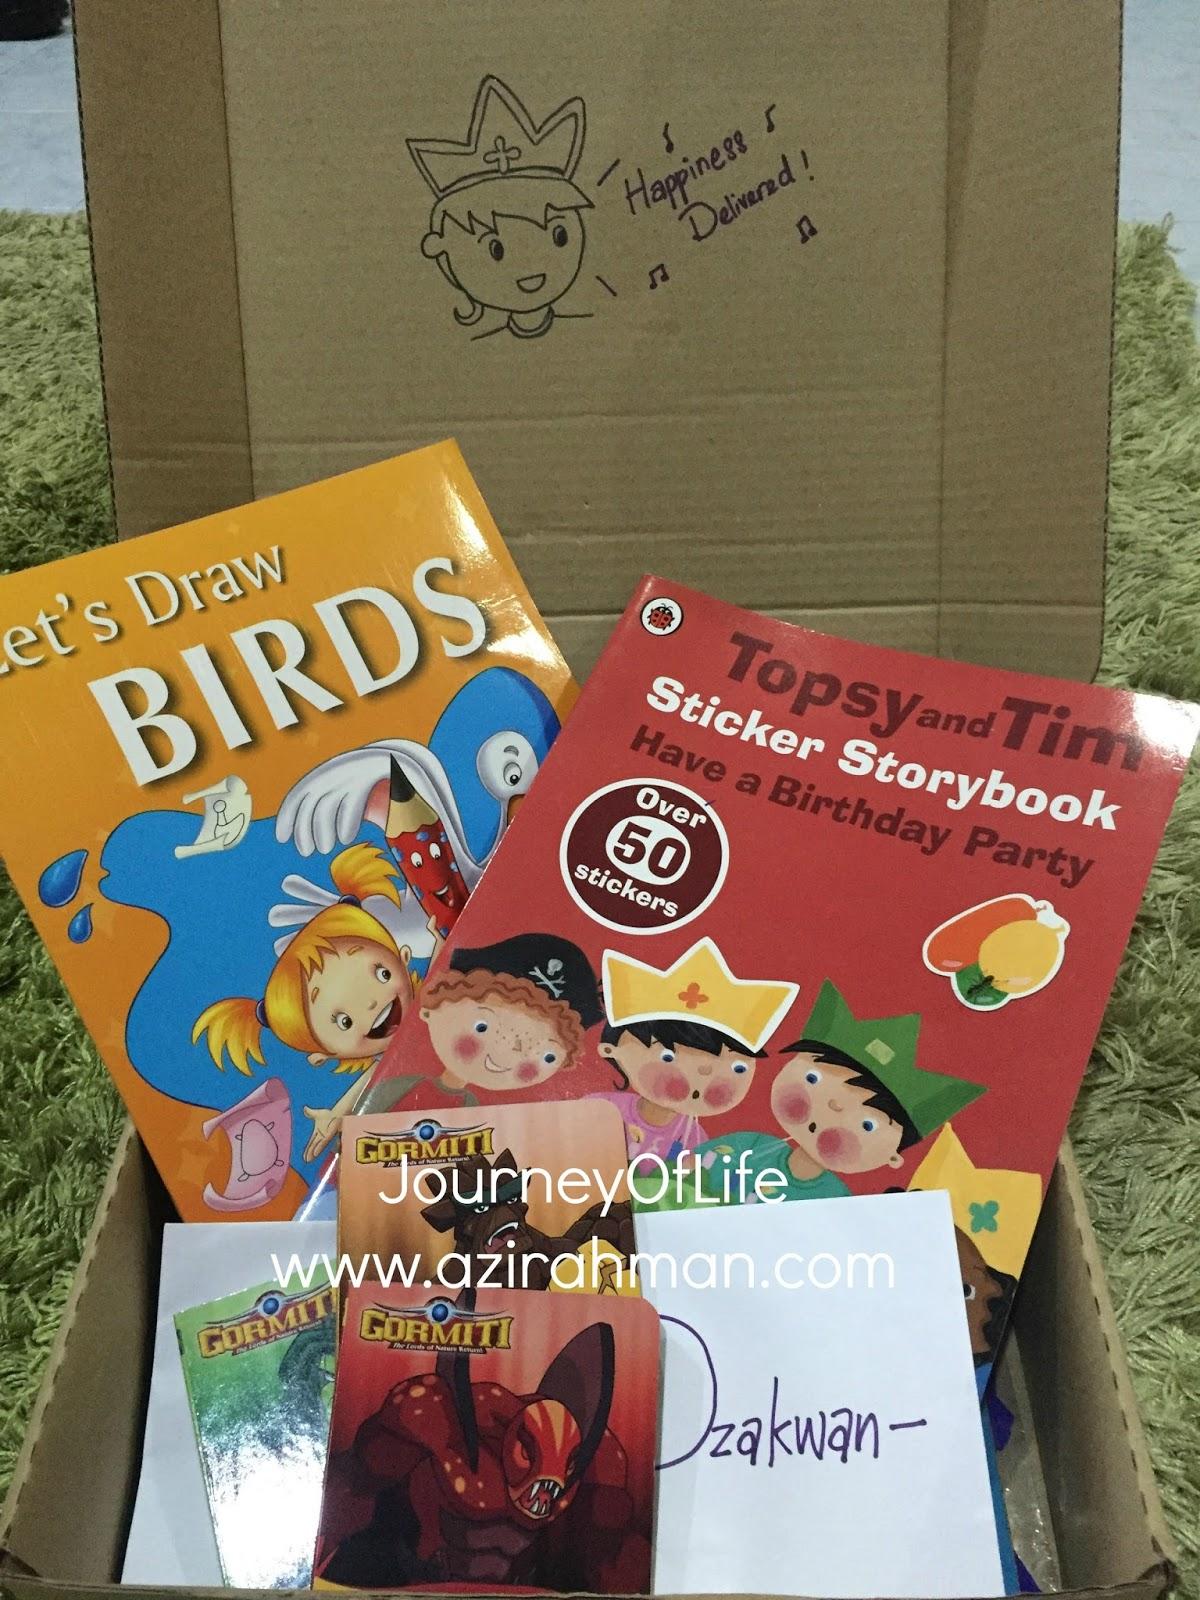 Dapatkan Buku-buku Menarik Untuk Anak-anak Anda di PEEKABOX